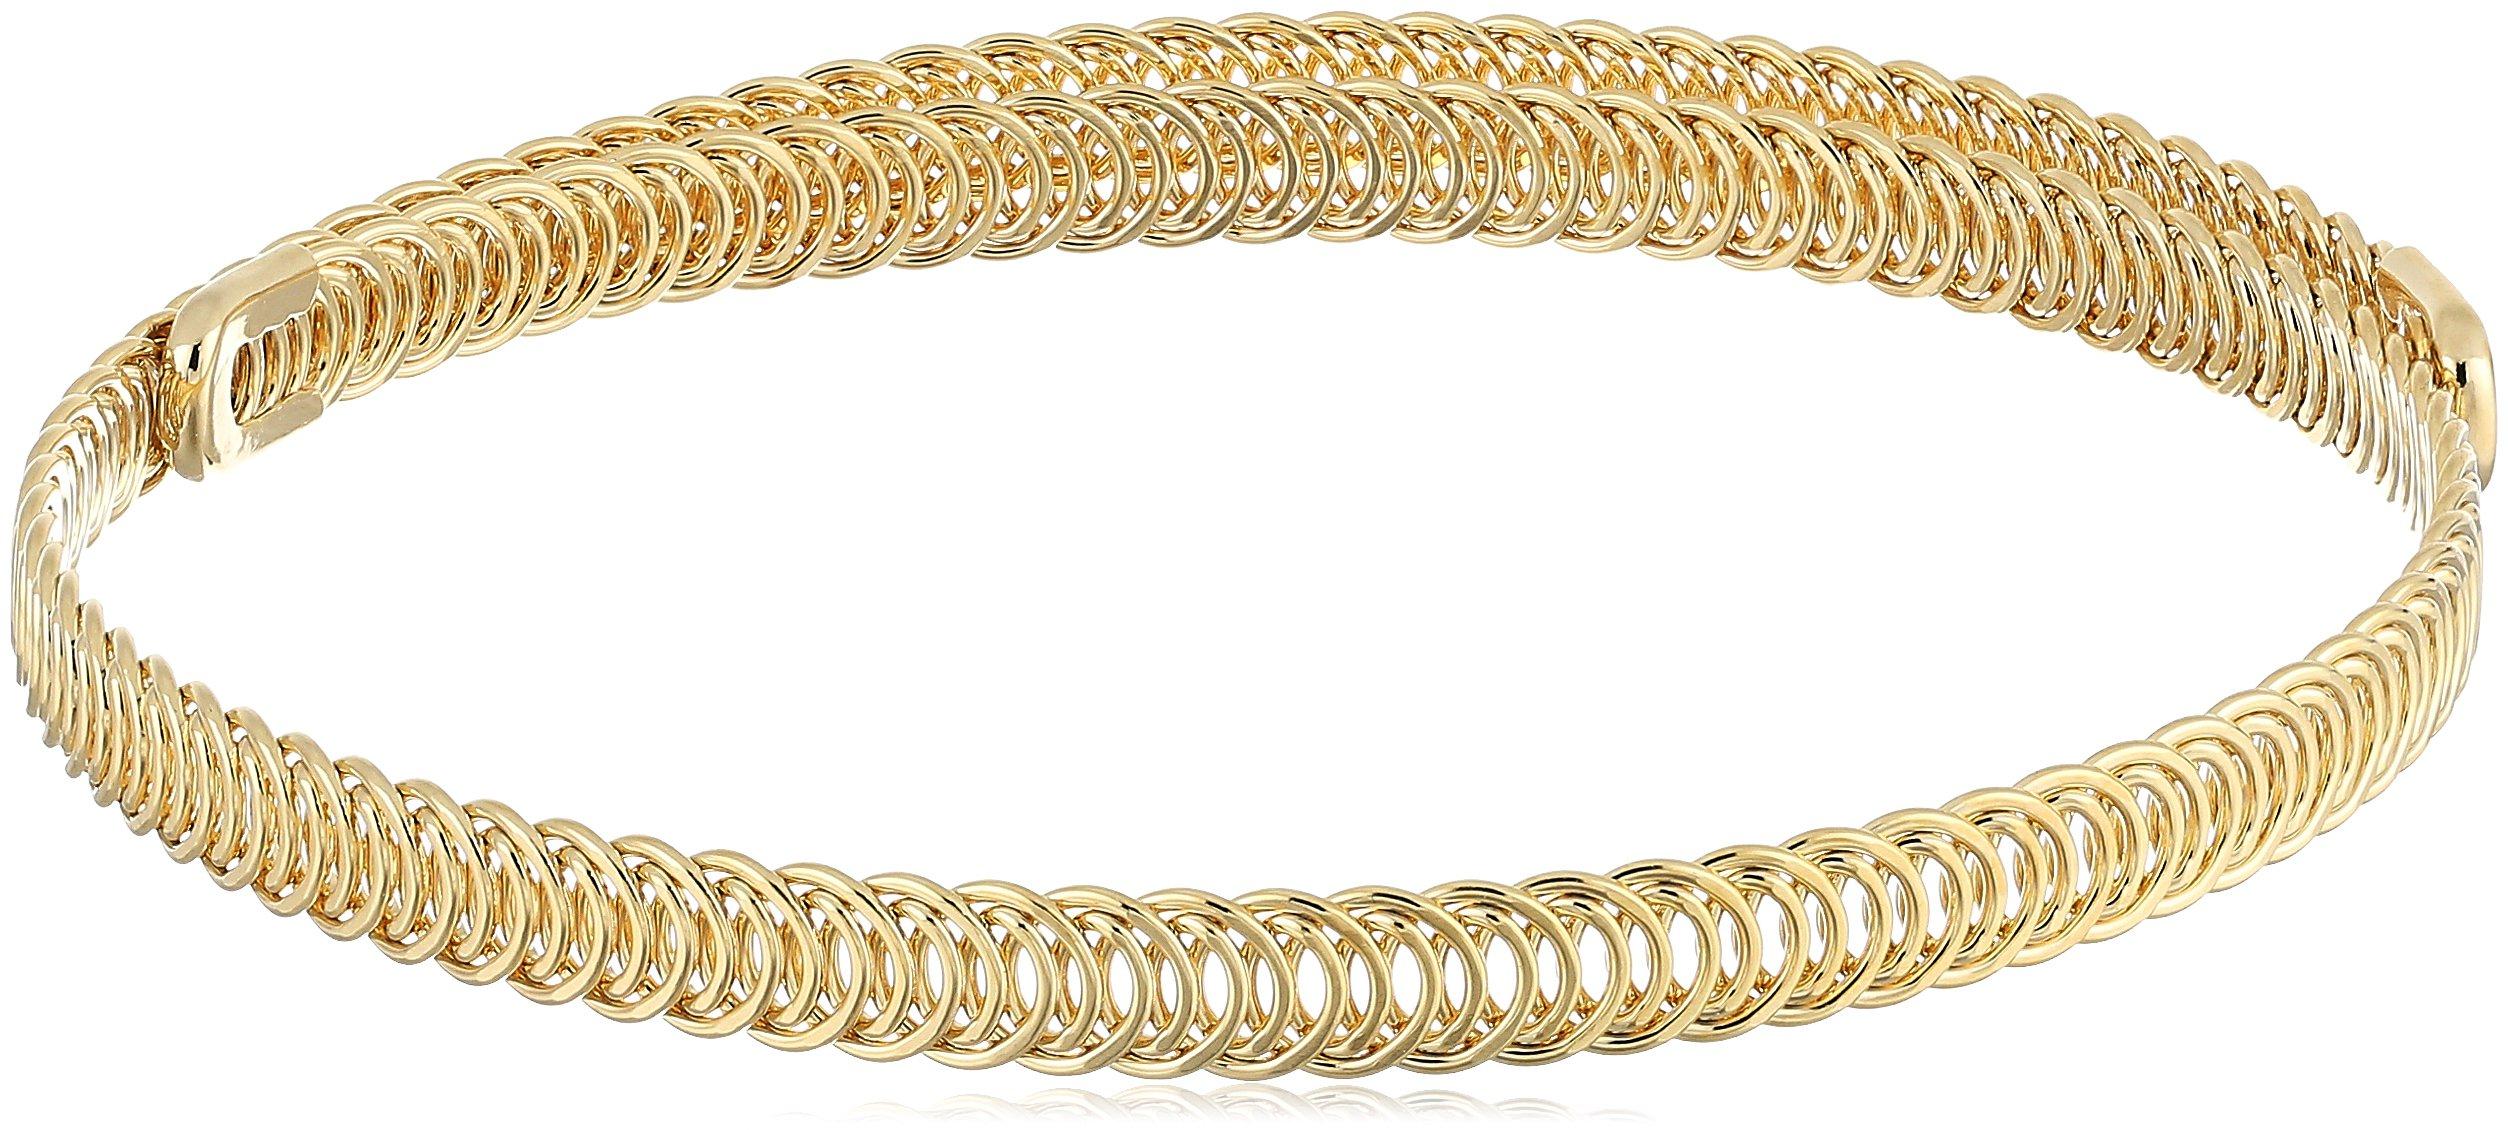 Kenneth Jay Lane Polished Gold Braided Choker Necklace